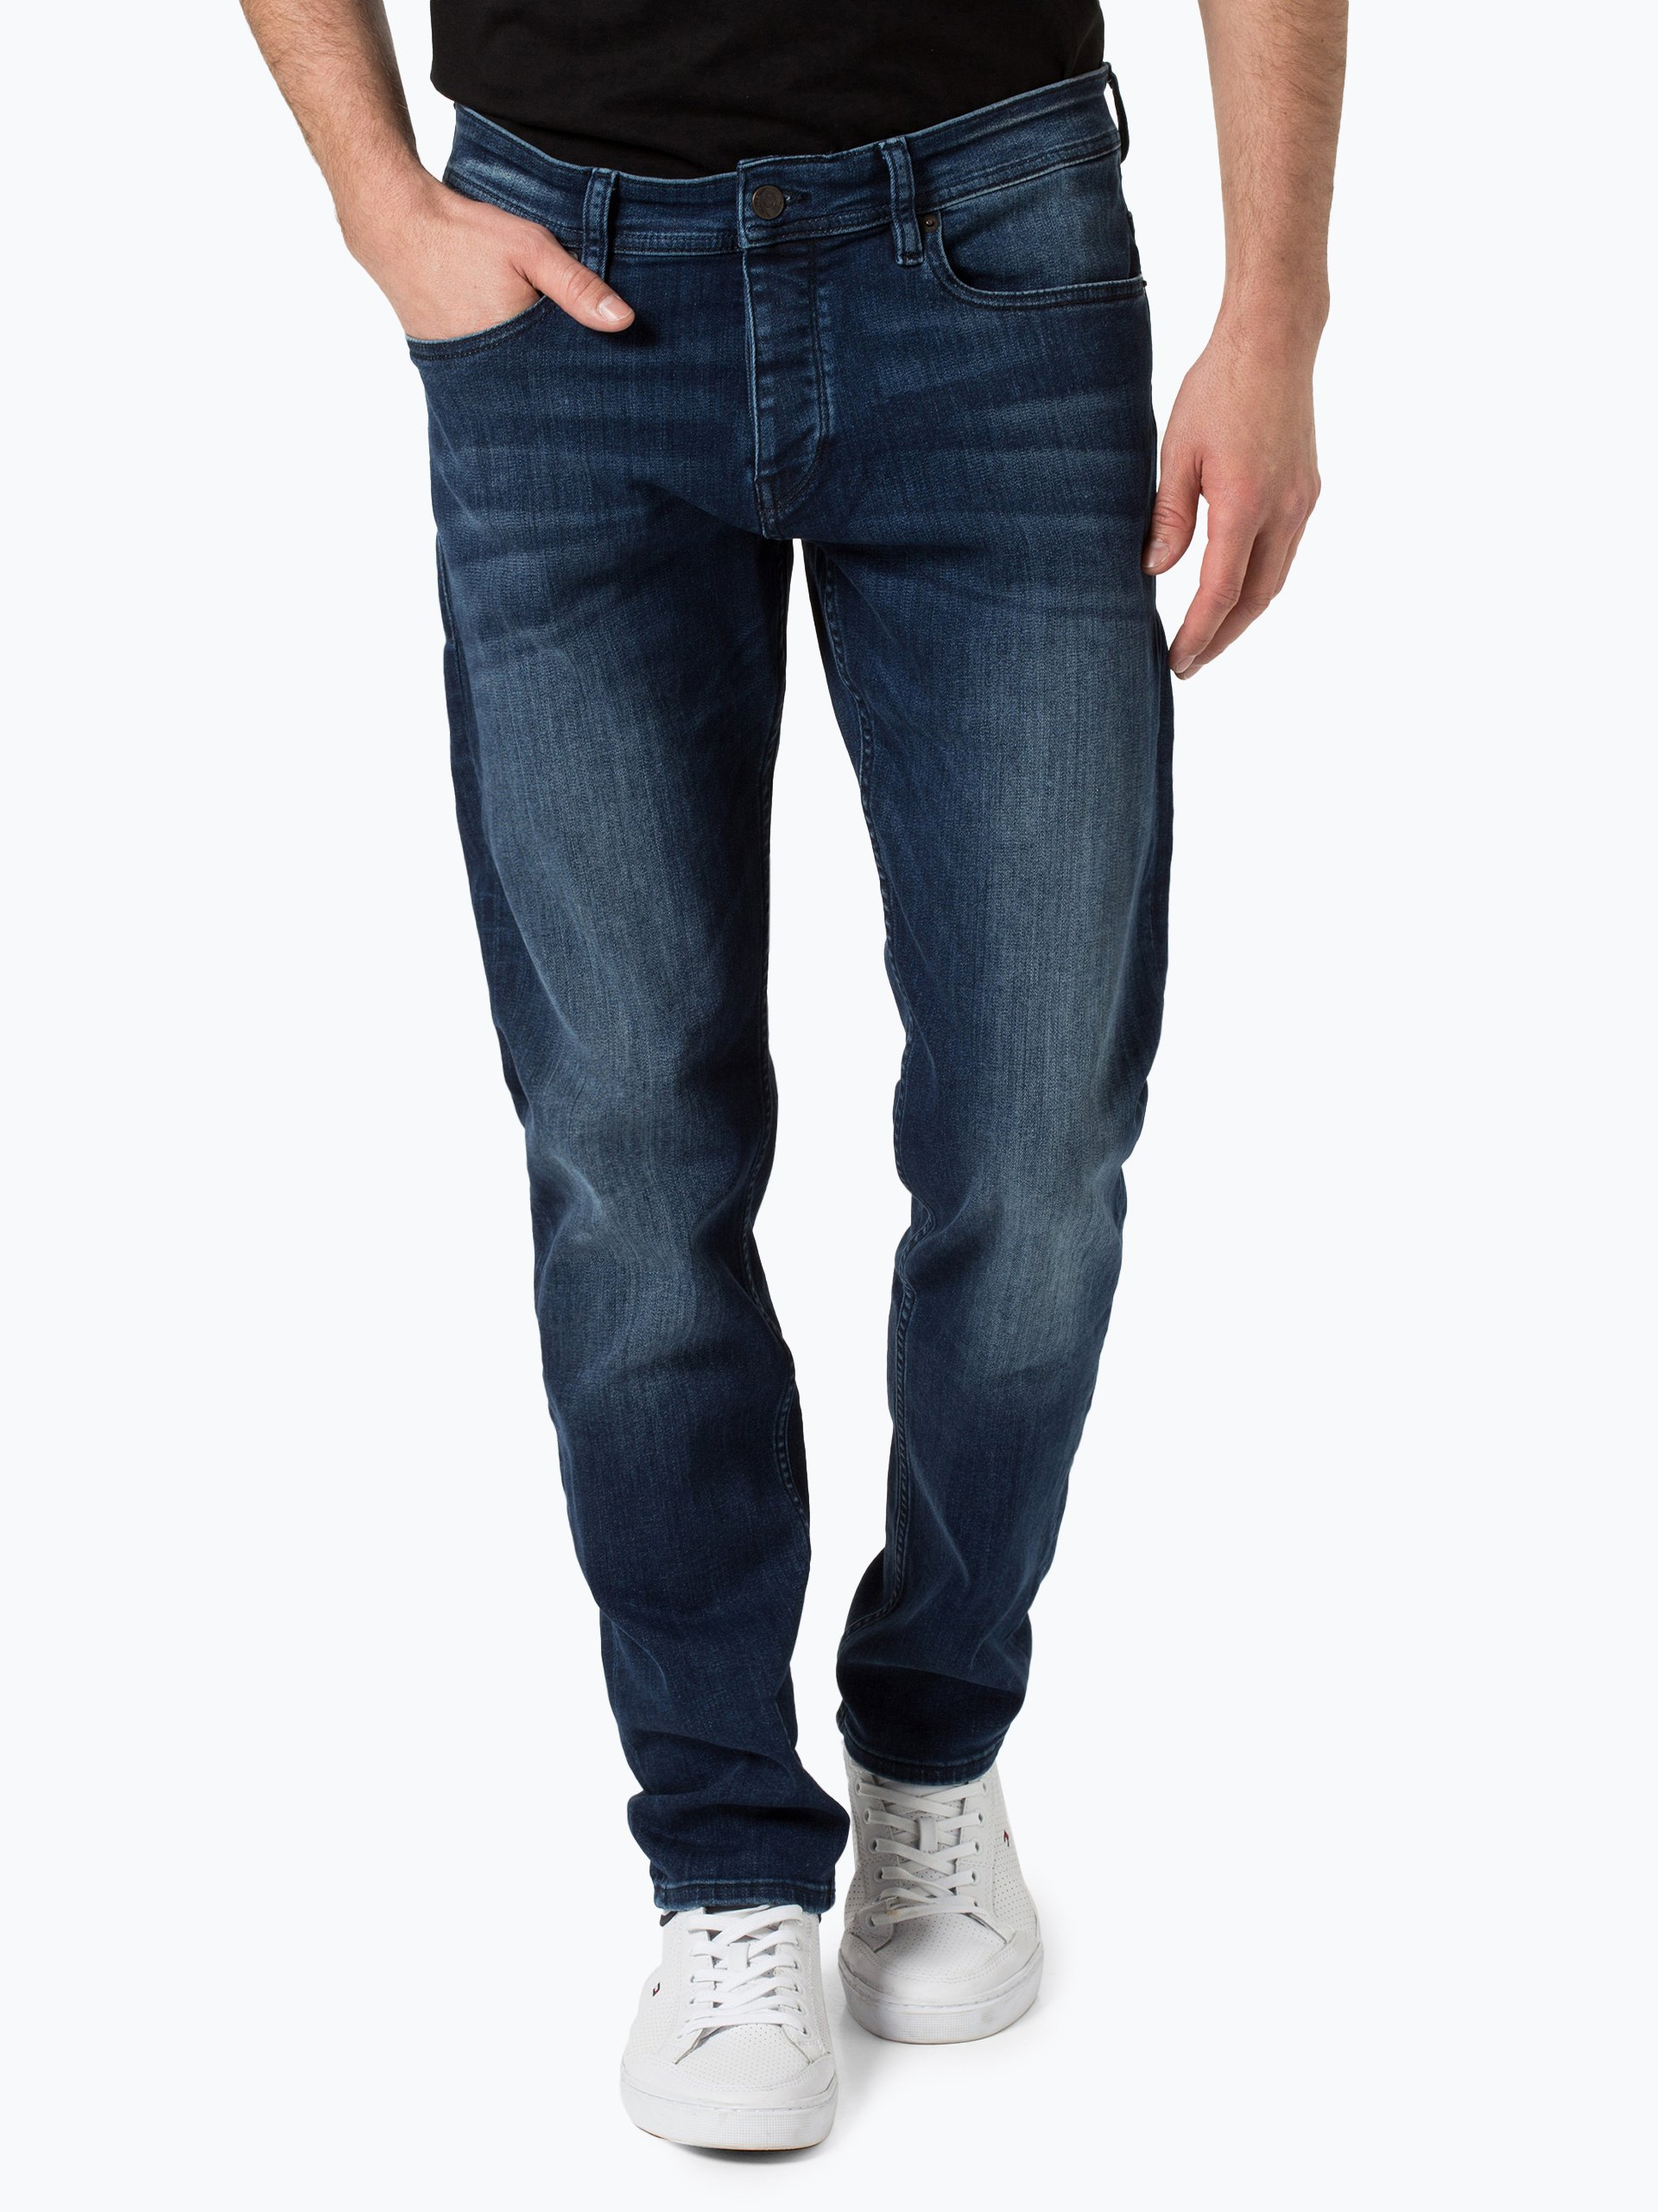 boss casual herren jeans orange90 blau uni online kaufen peek und cloppenburg de. Black Bedroom Furniture Sets. Home Design Ideas